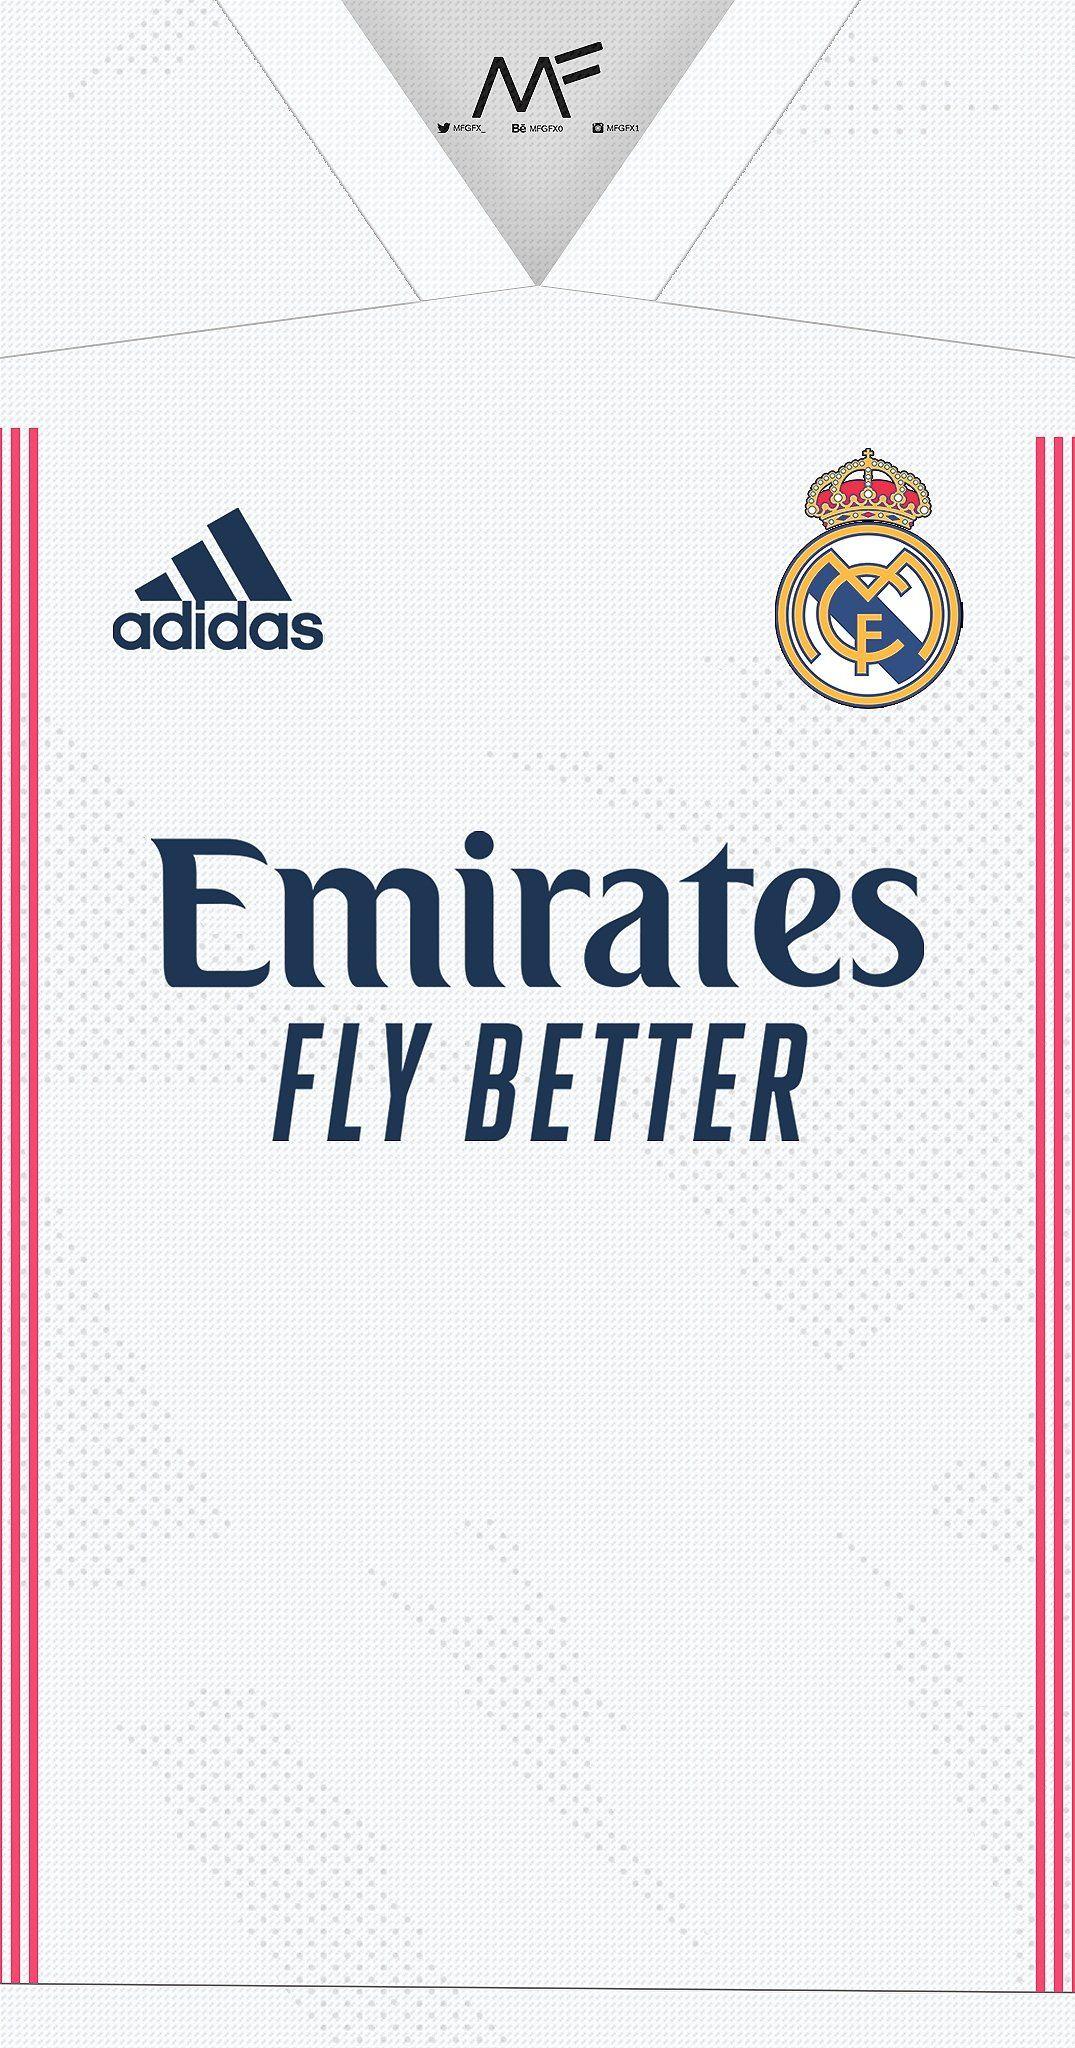 Real Madrid 2020 2021 Fonds D Ecran Des Kits Domicile Et Exterieur Camisetas De Equipo Camisetas De Futbol Fondos De Pantalla Real Madrid